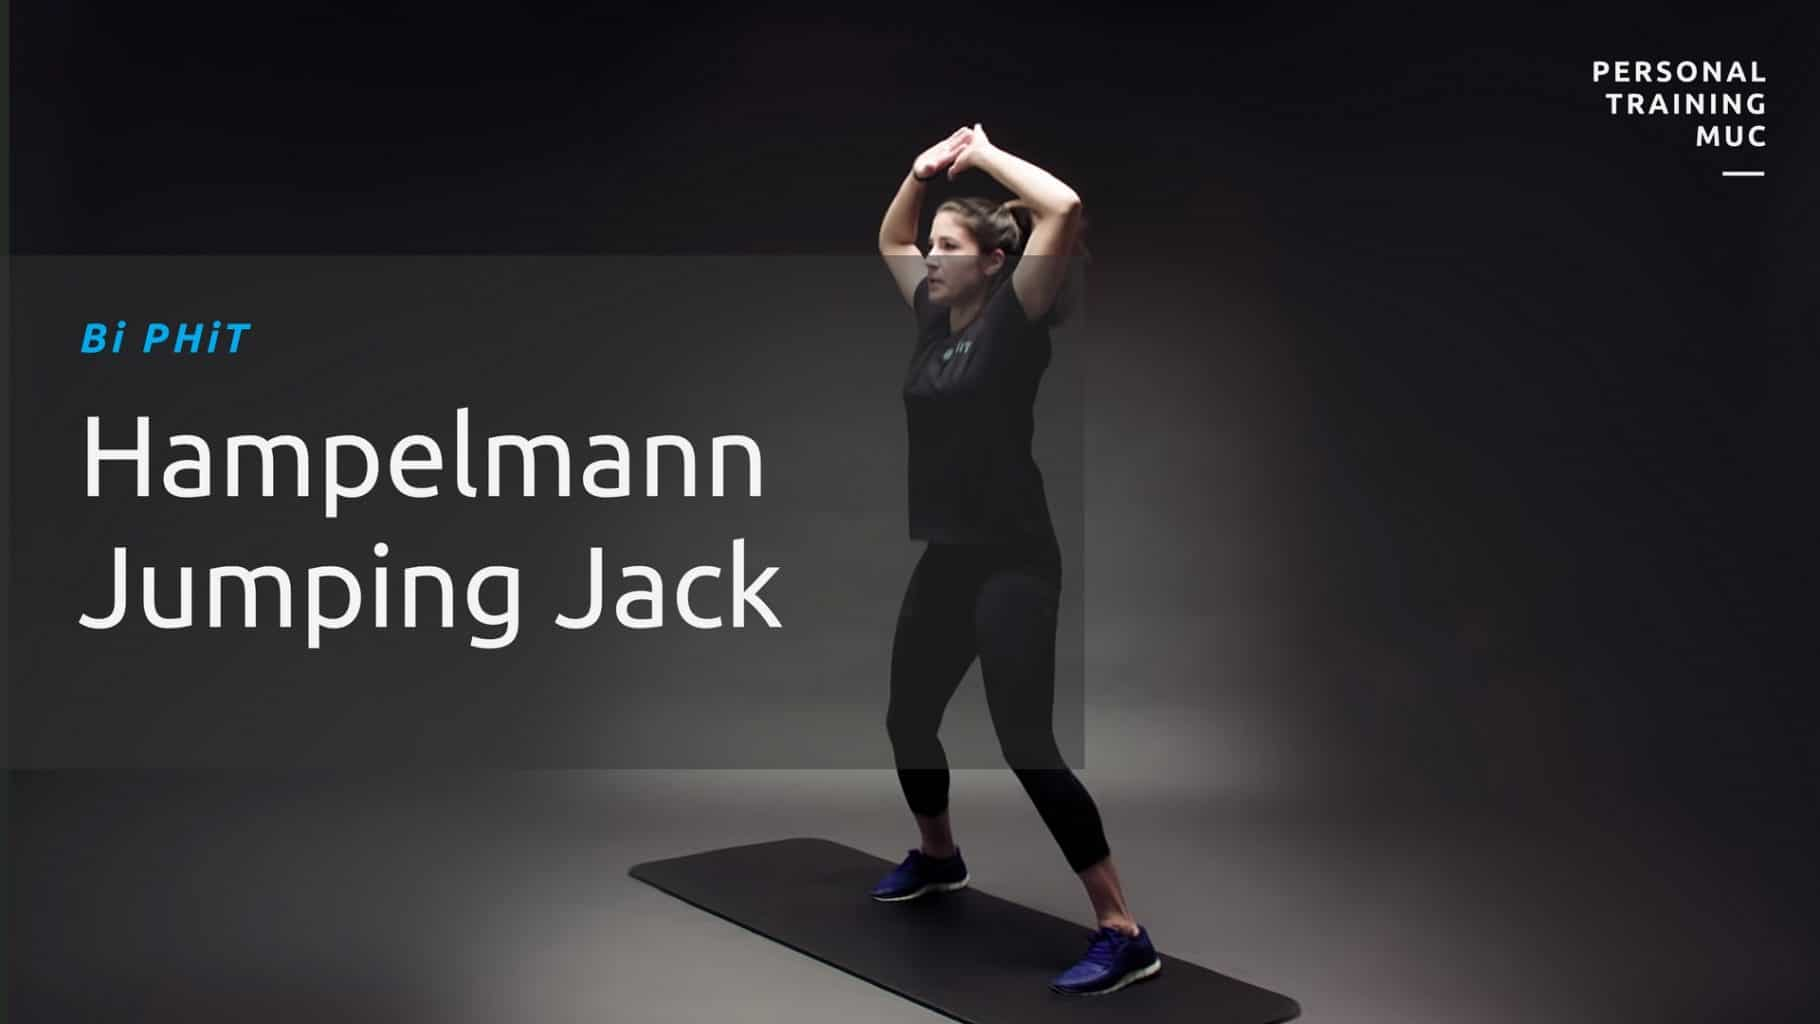 Jumping Jacks oder Hampelmann